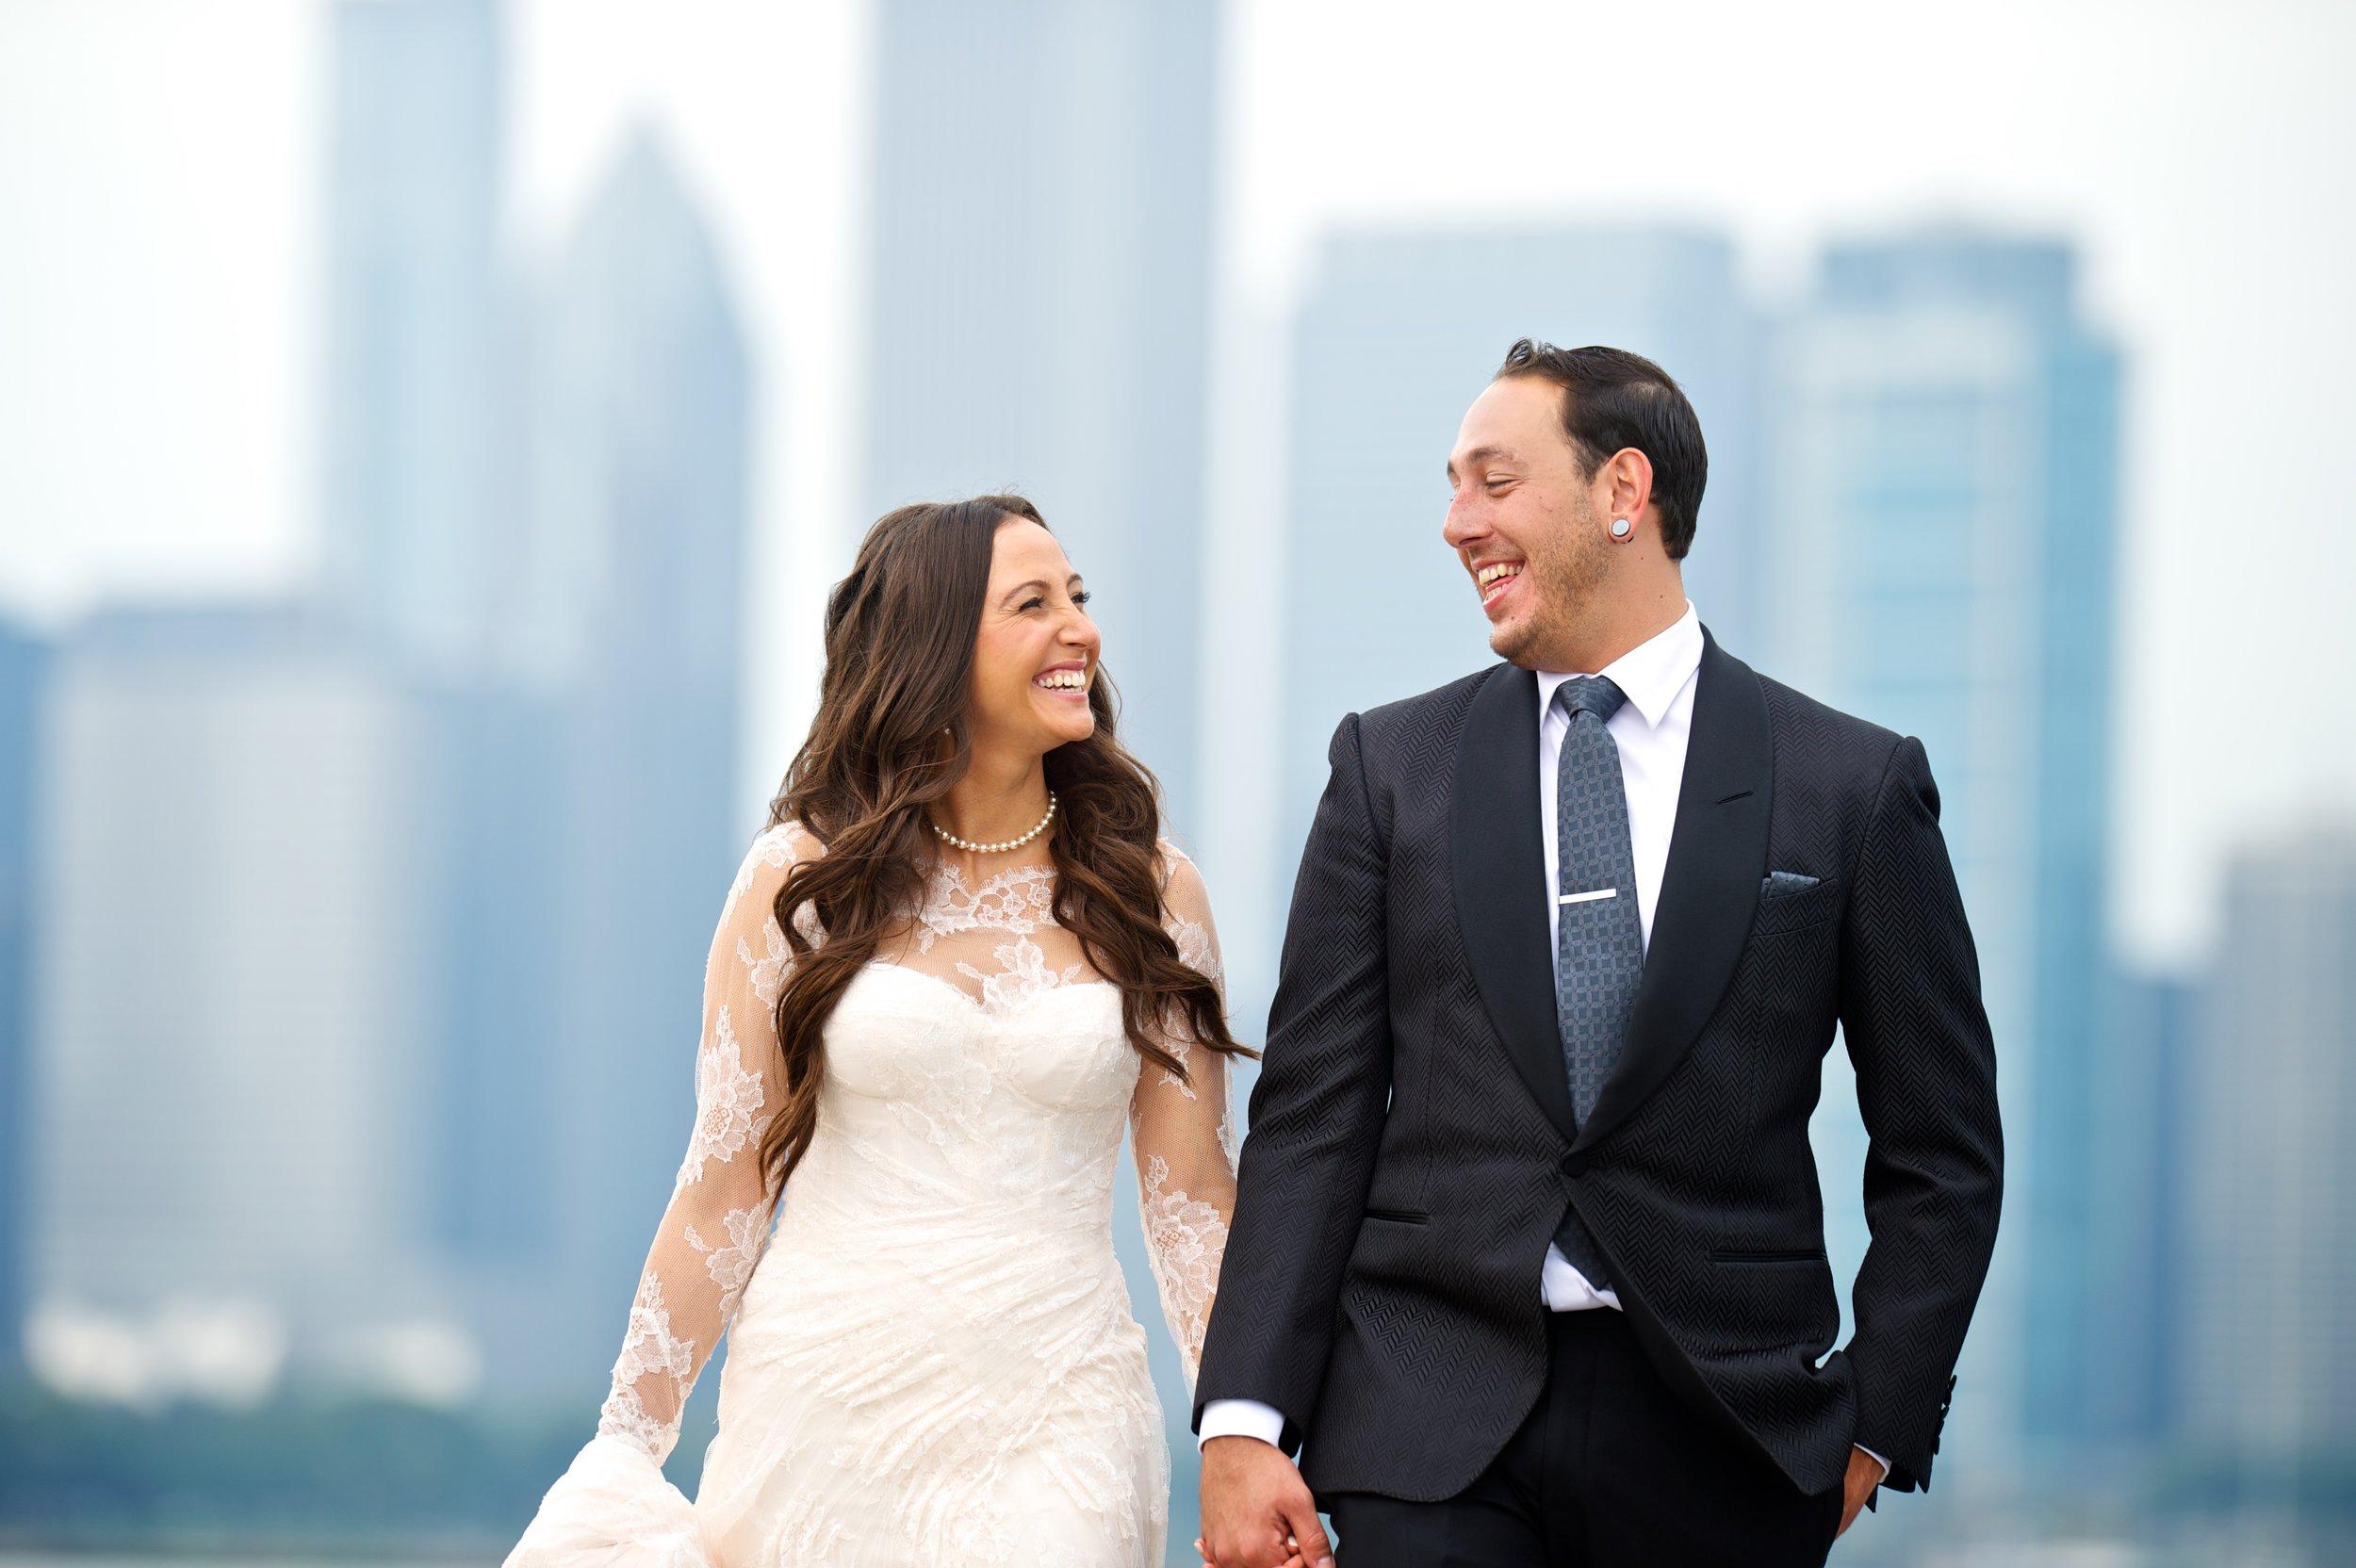 skyline wedding photography